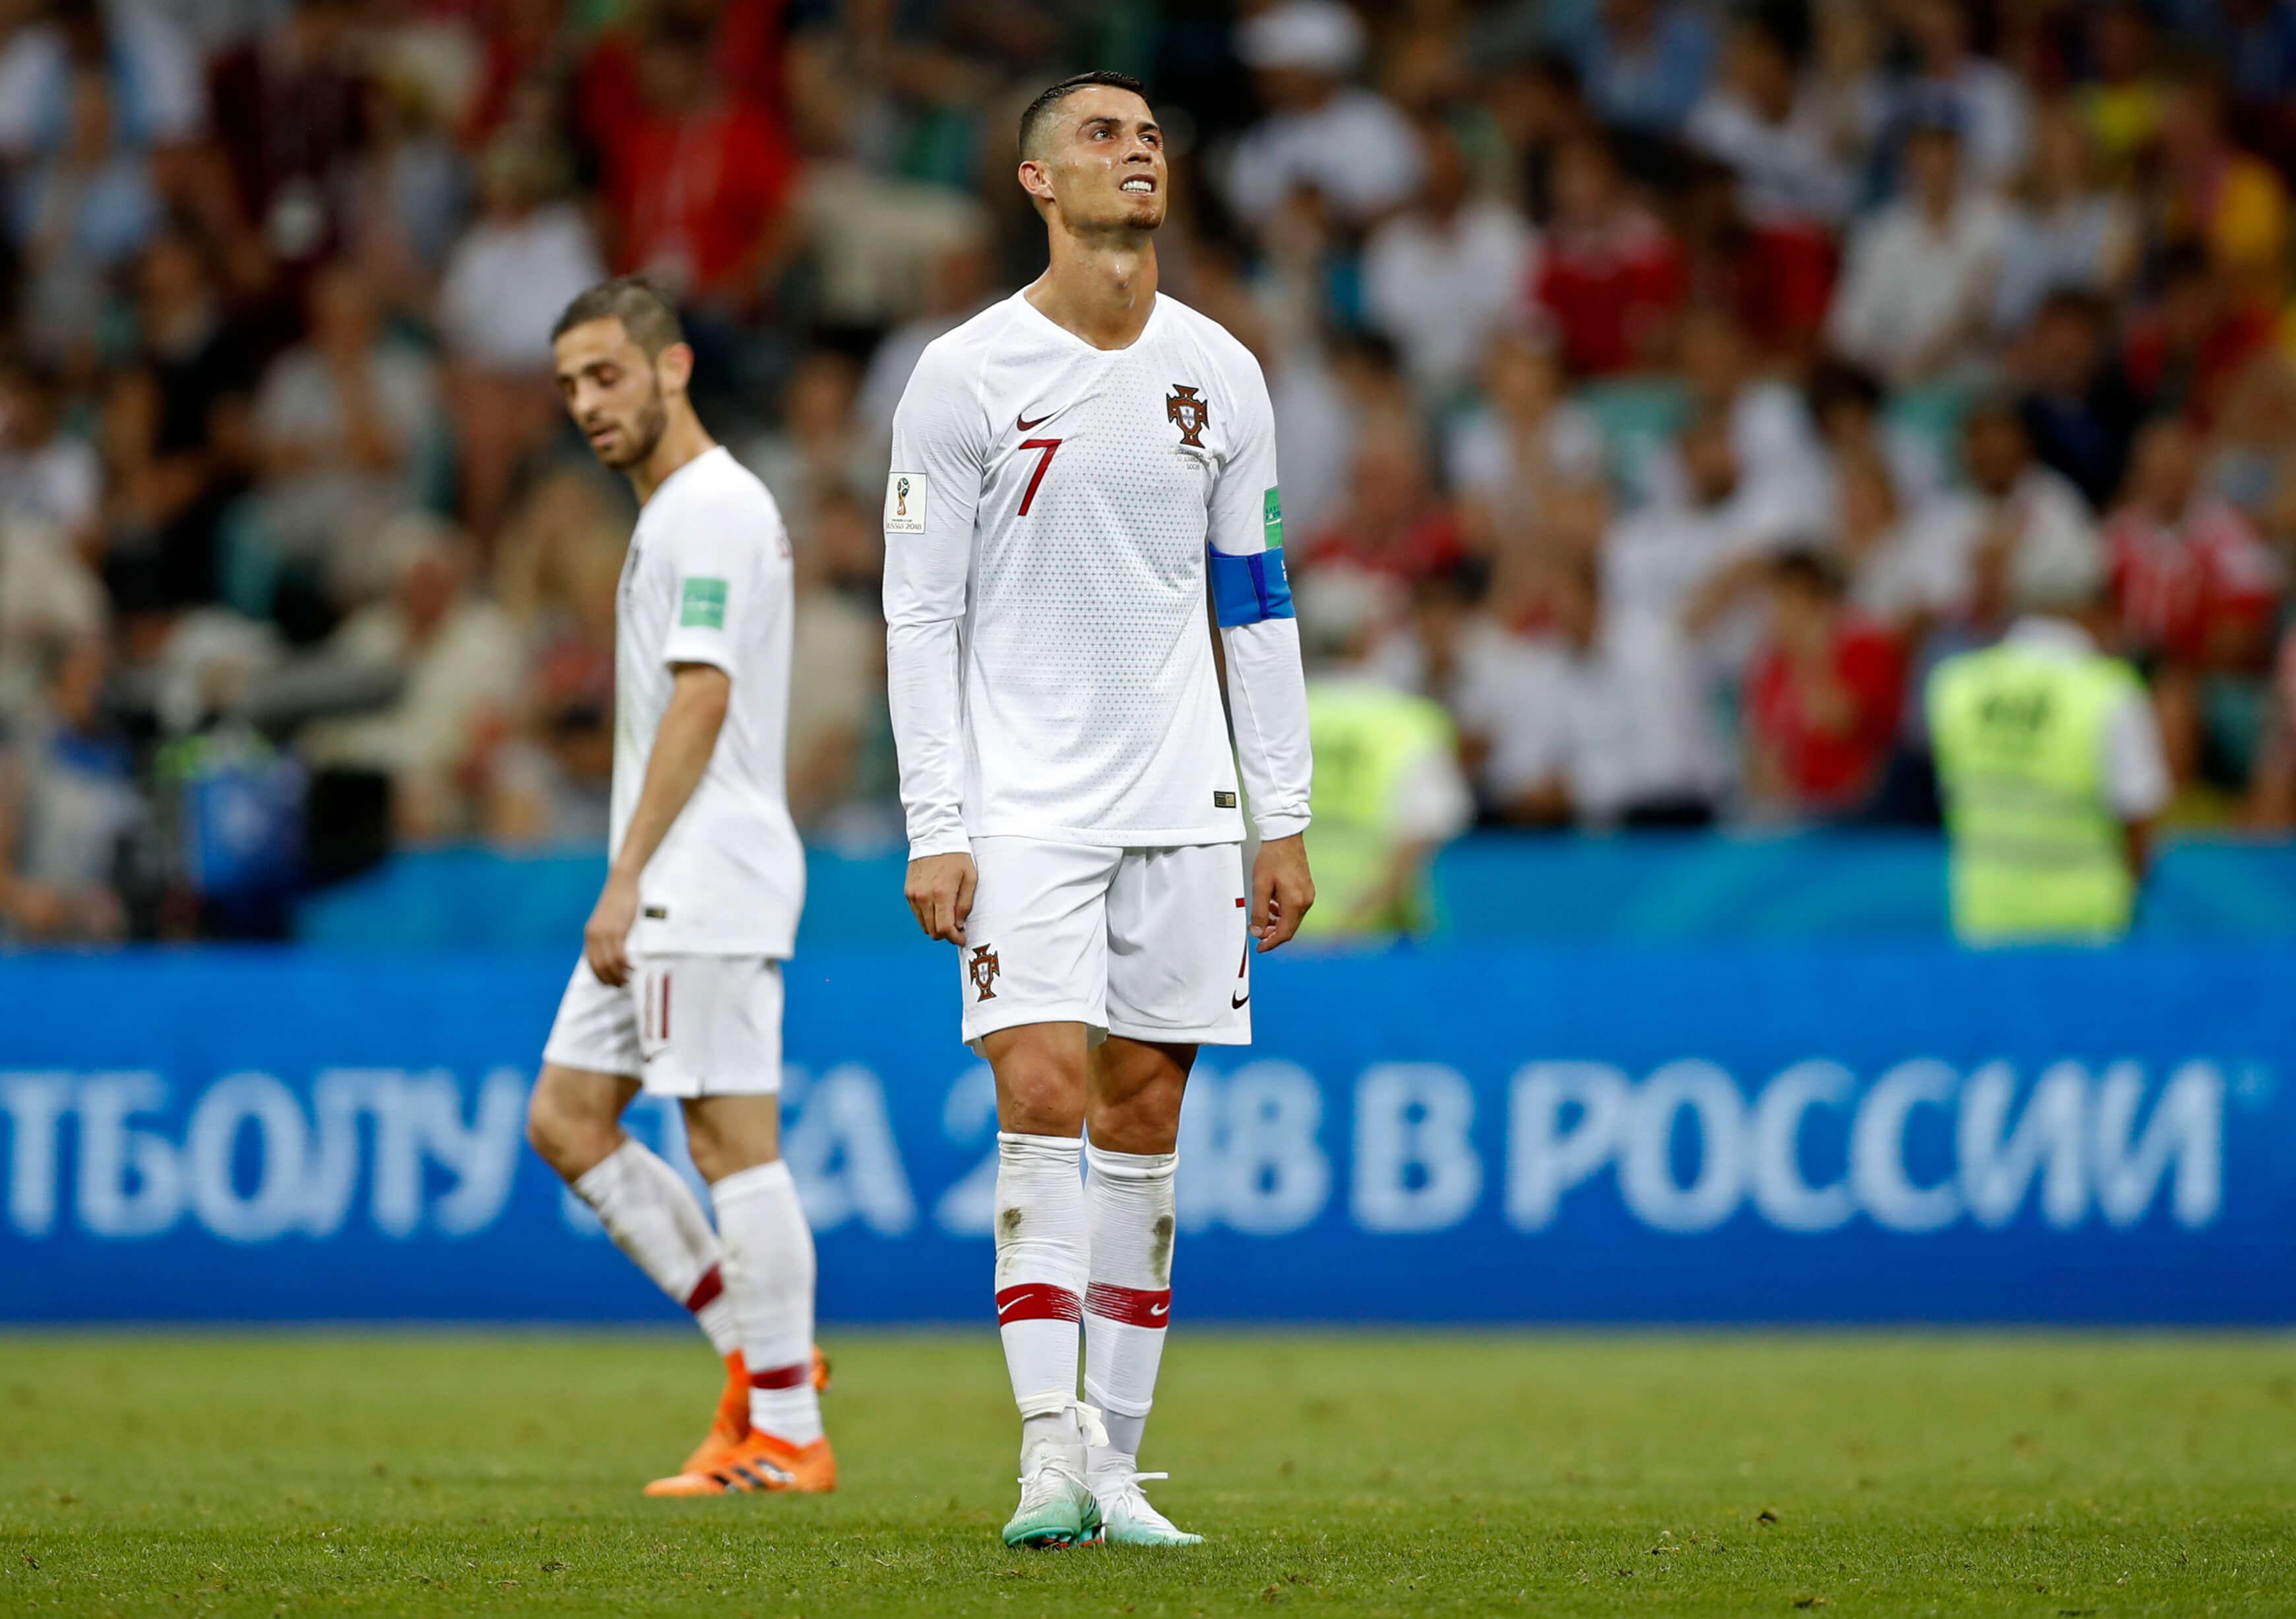 Mundial Rusia 2018 Neymar Cristiano Ronaldo y Messi